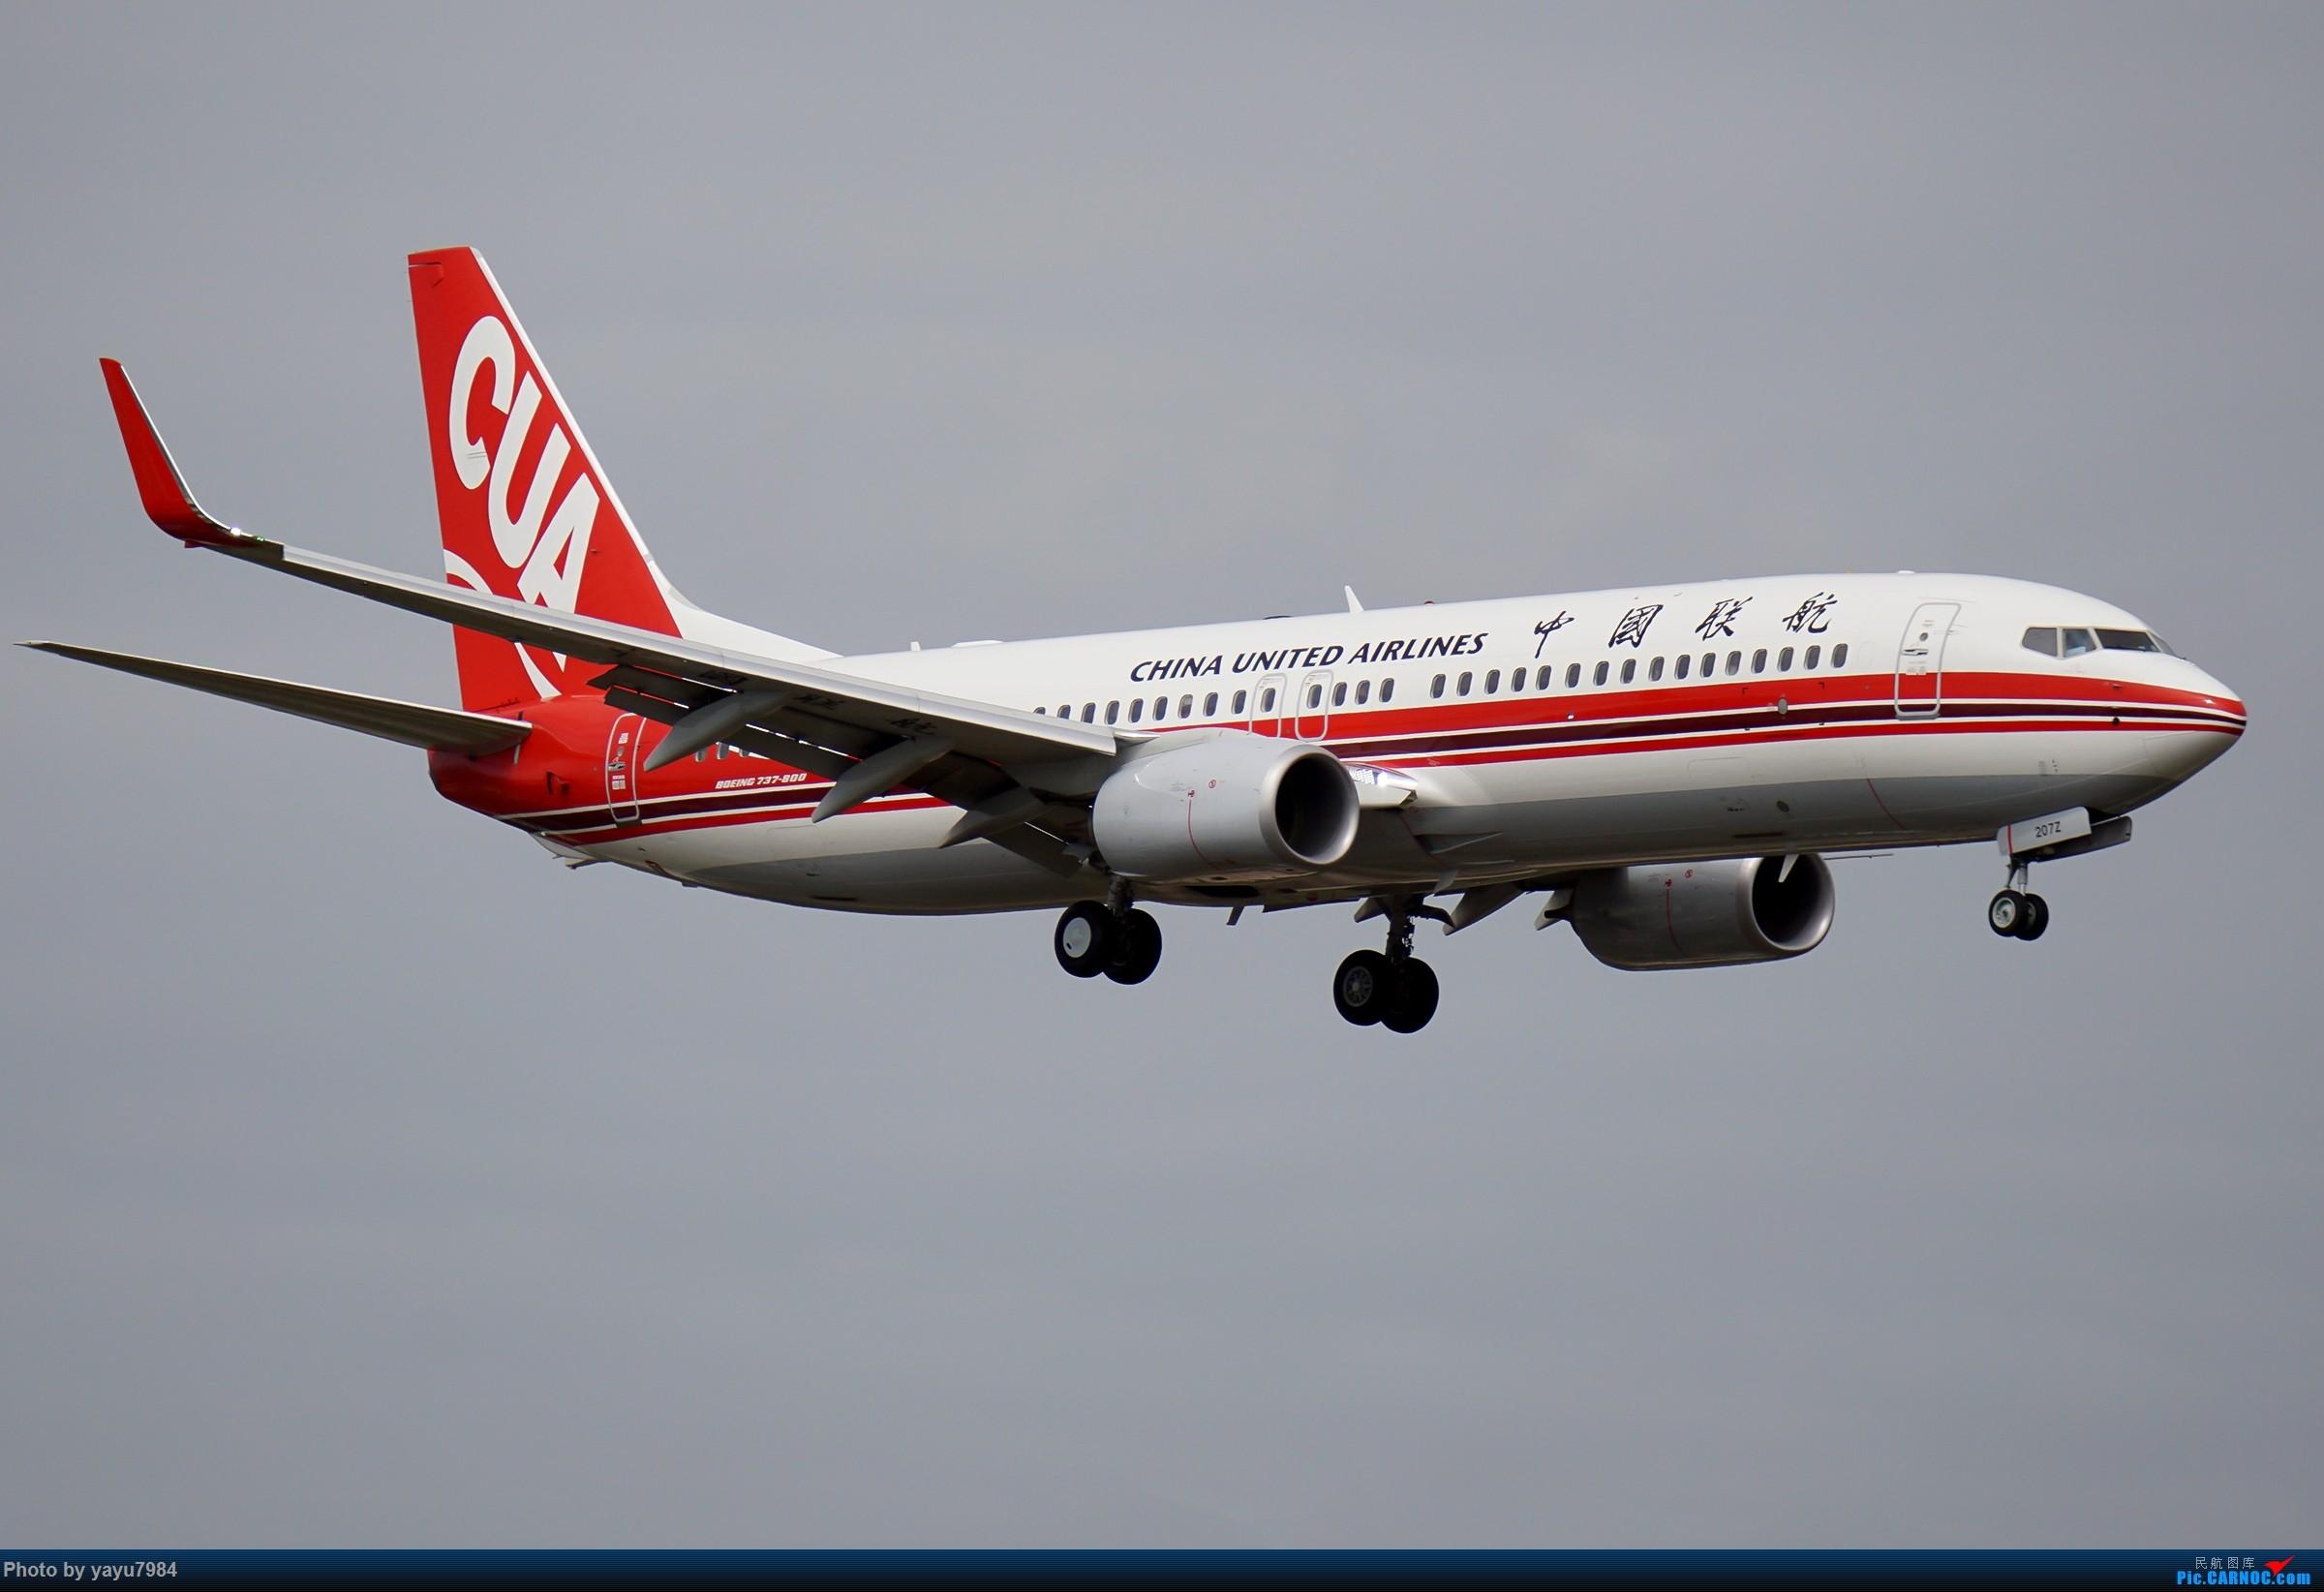 Re:[原创][SYX] 回国首拍,春运高峰时段的三亚凤凰国际机场 BOEING 737-800 B-207Z 中国三亚凤凰国际机场